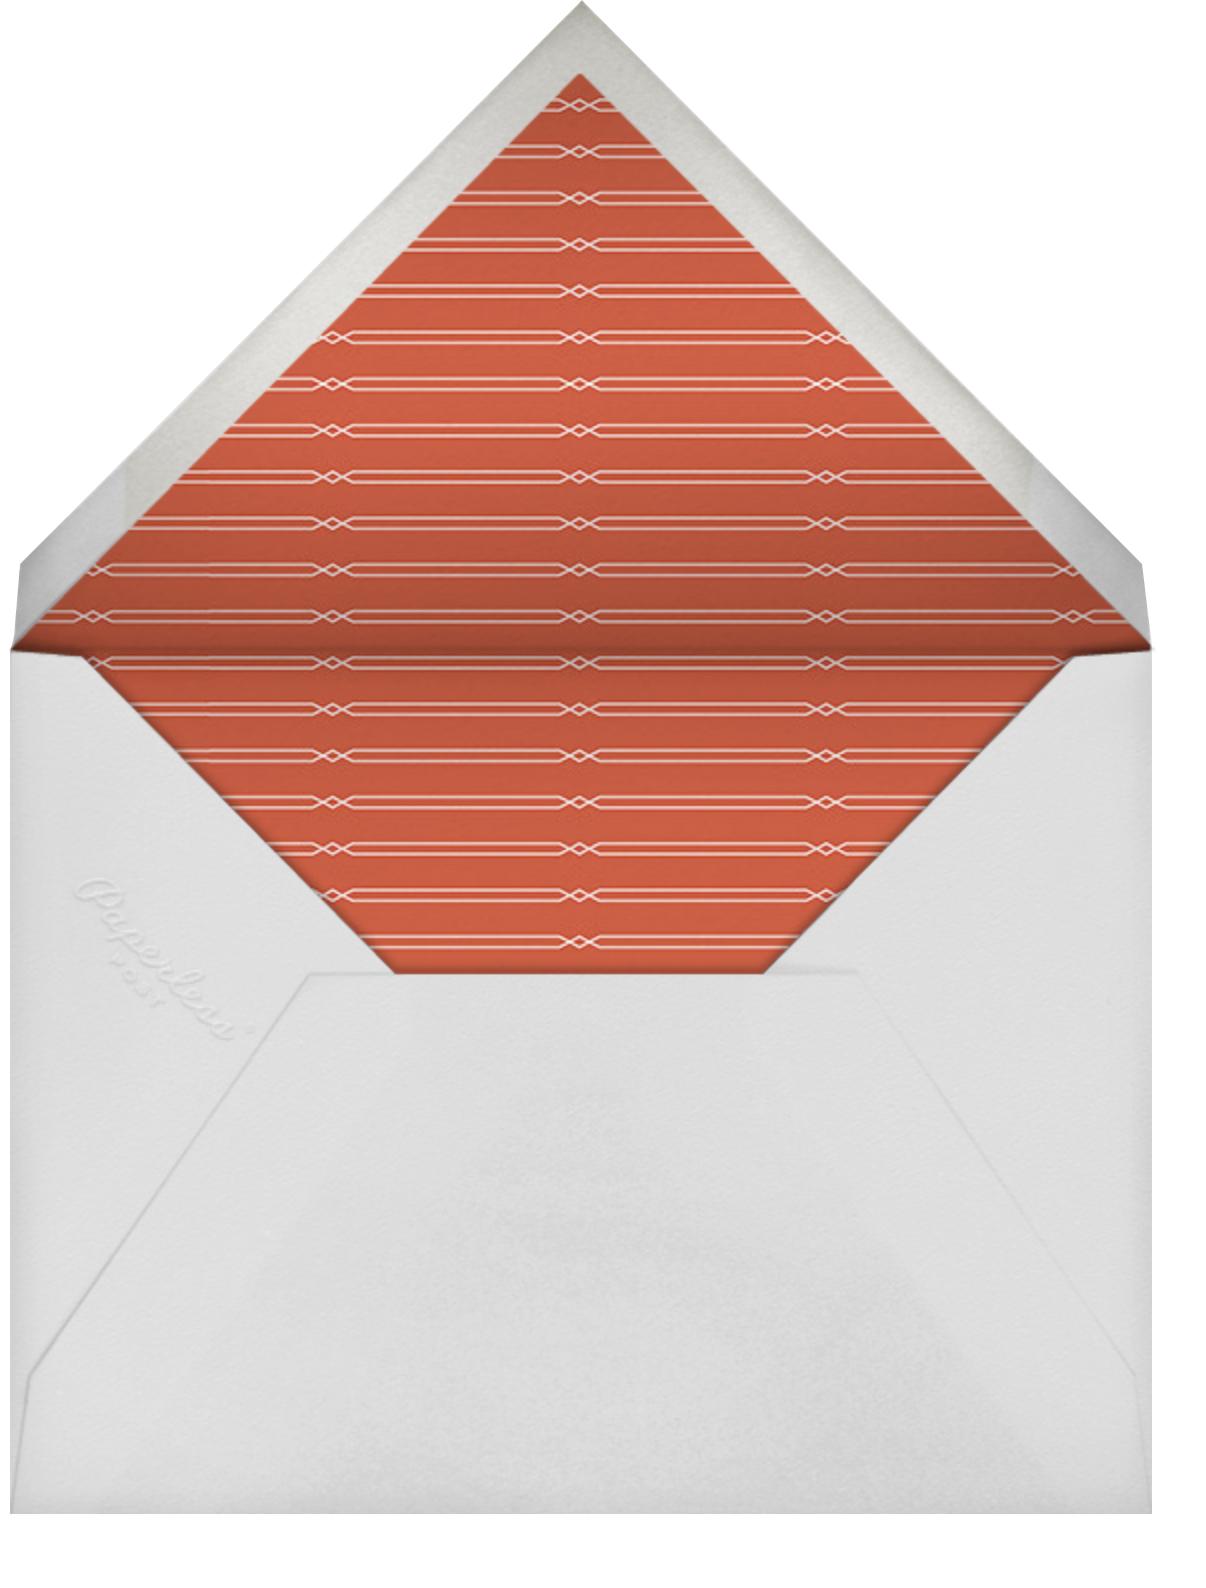 Wintry Tune - Christmas - Paperless Post - Envelope